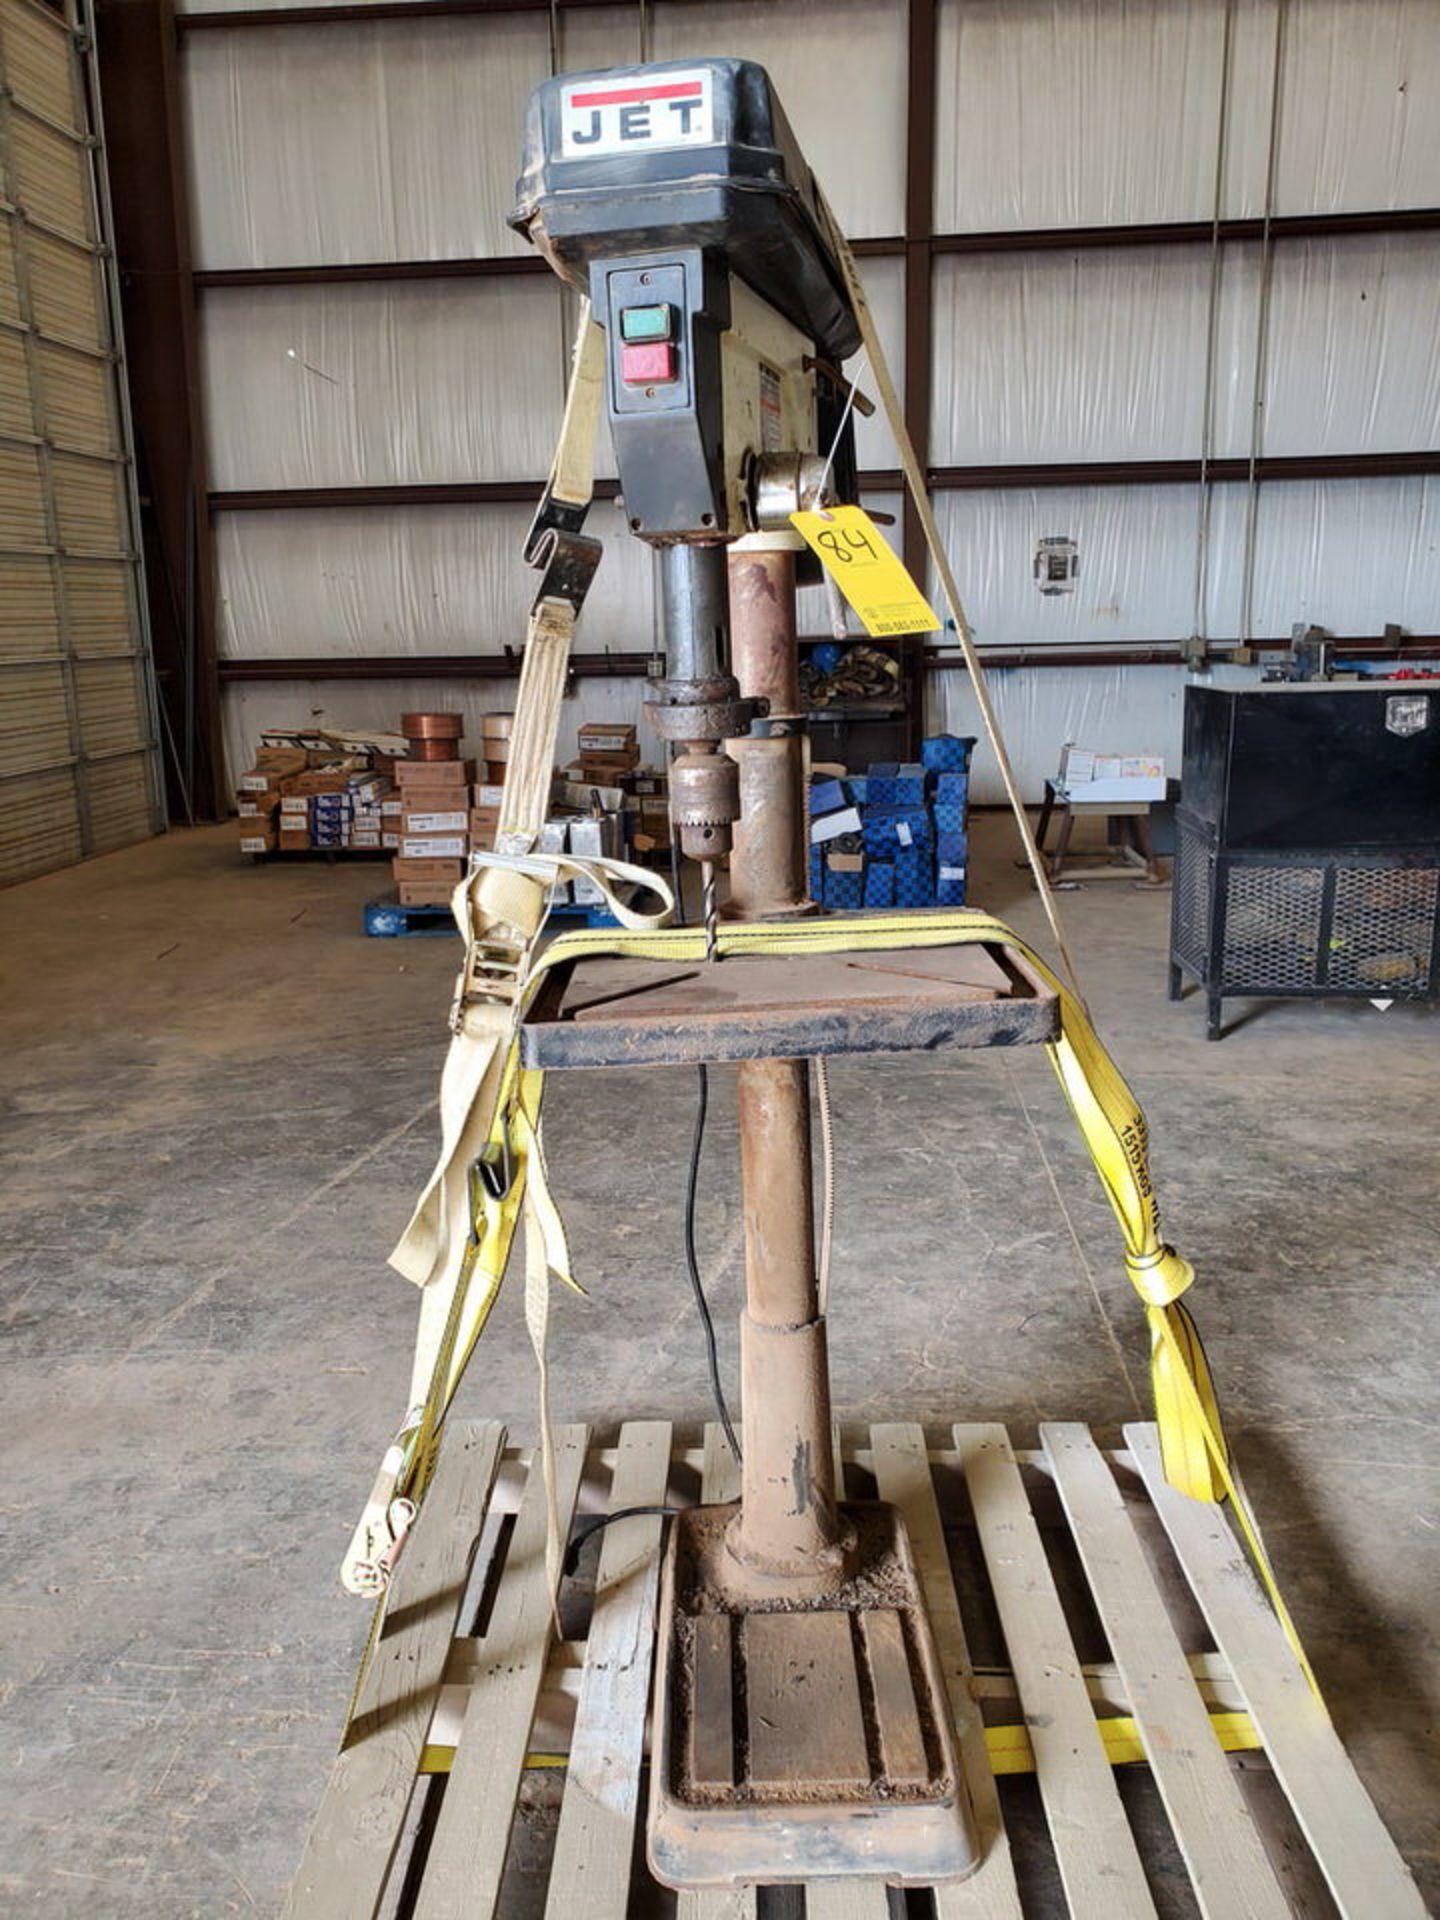 "JDP-20MF 20"" Drill Press 115/230V, 1-1/2HP, 1720RPM, 1"" Drilling Cap.; 16"" x 18"" Work Table - Image 2 of 8"